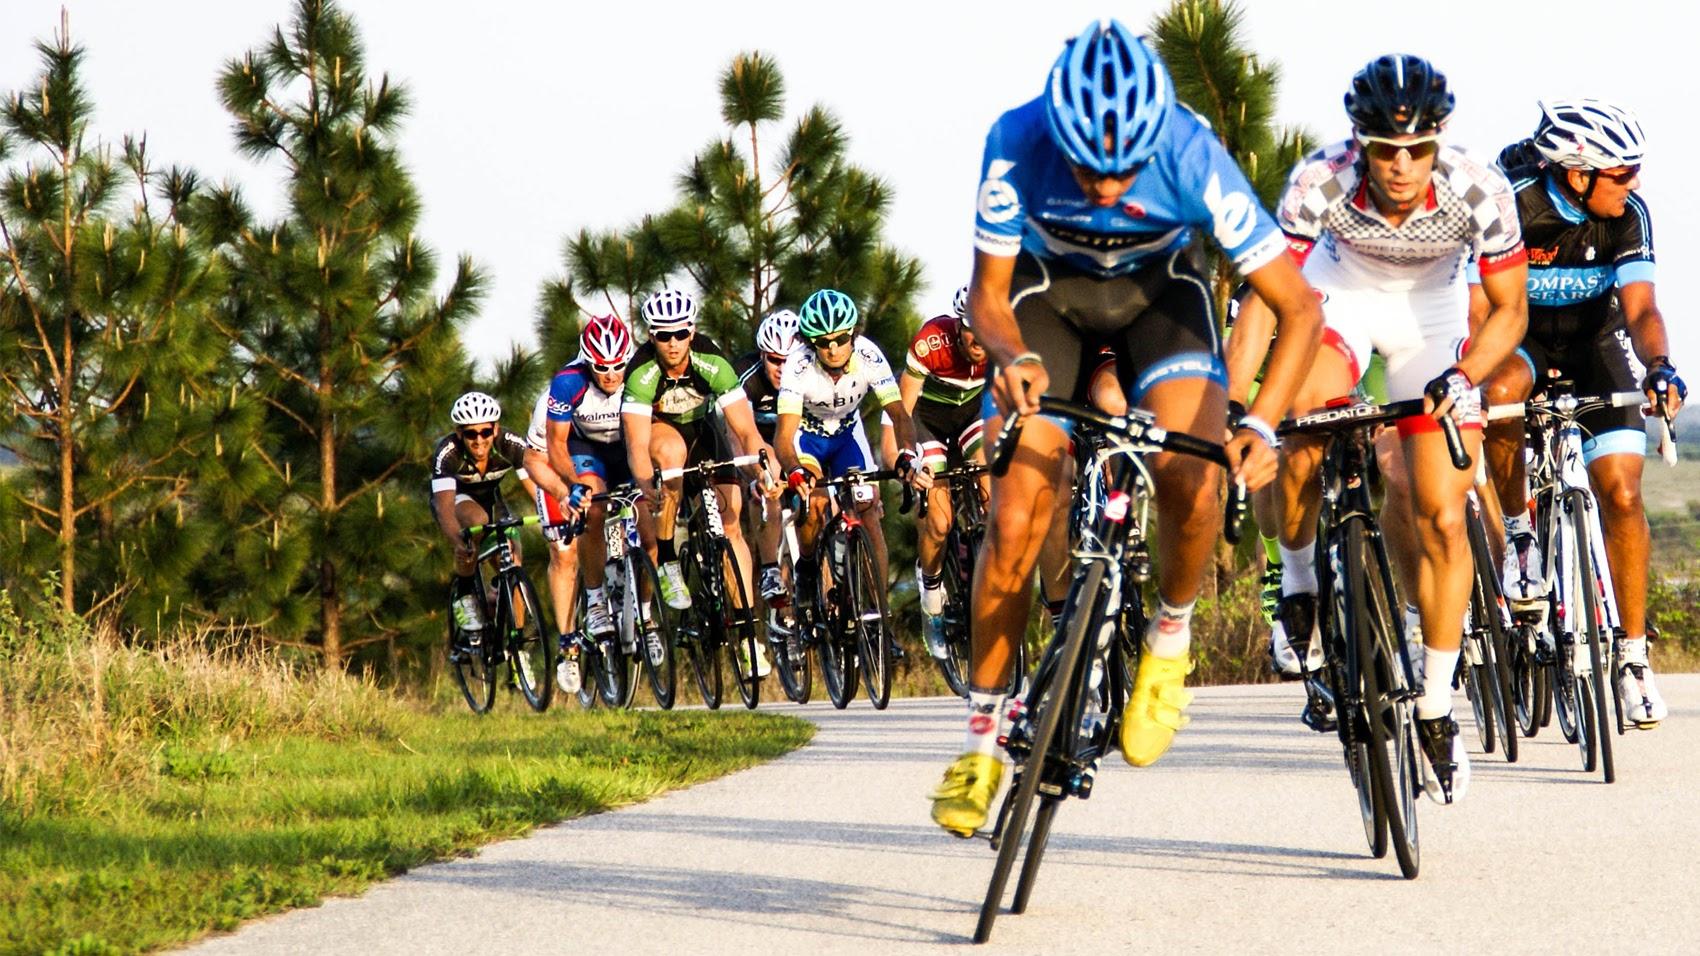 Road Bike Racing Wallpaper Florida bicycle racing association 56 1700x956